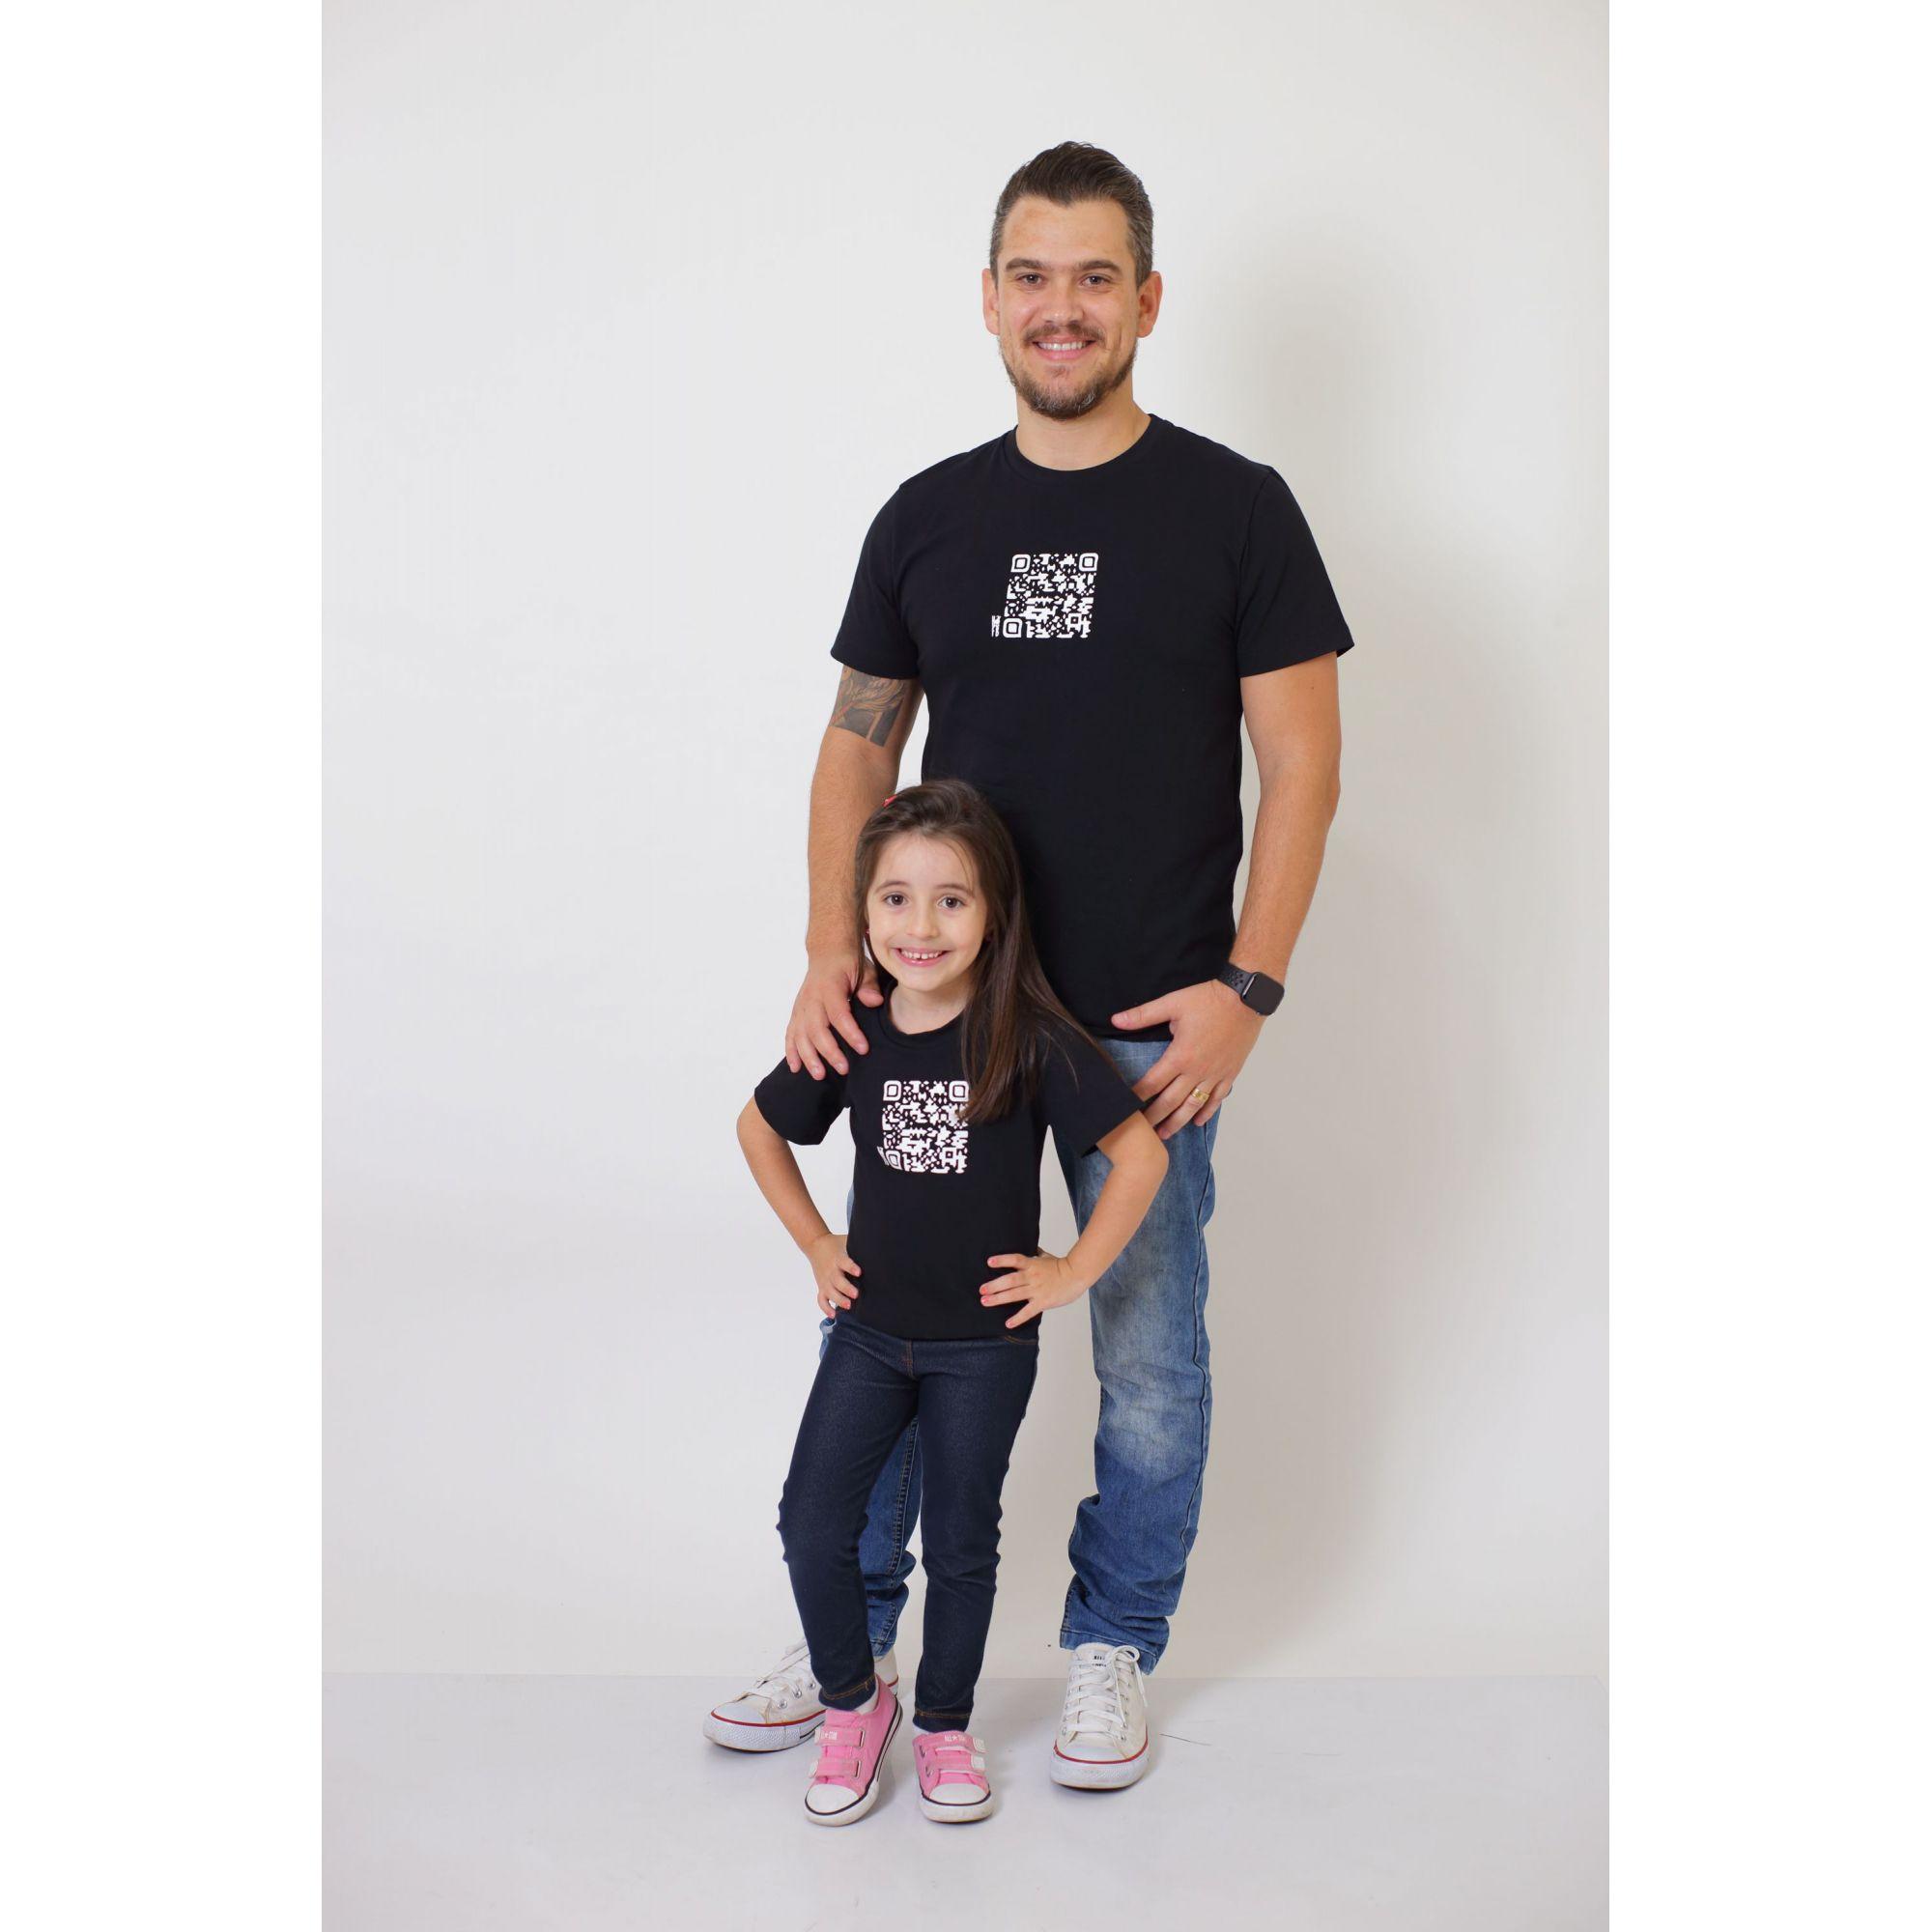 PAI E FILHOS > 02 T-Shirts - Preto - QRCODE  [Coleção Tal Pai Tal Filho]  - Heitor Fashion Brazil